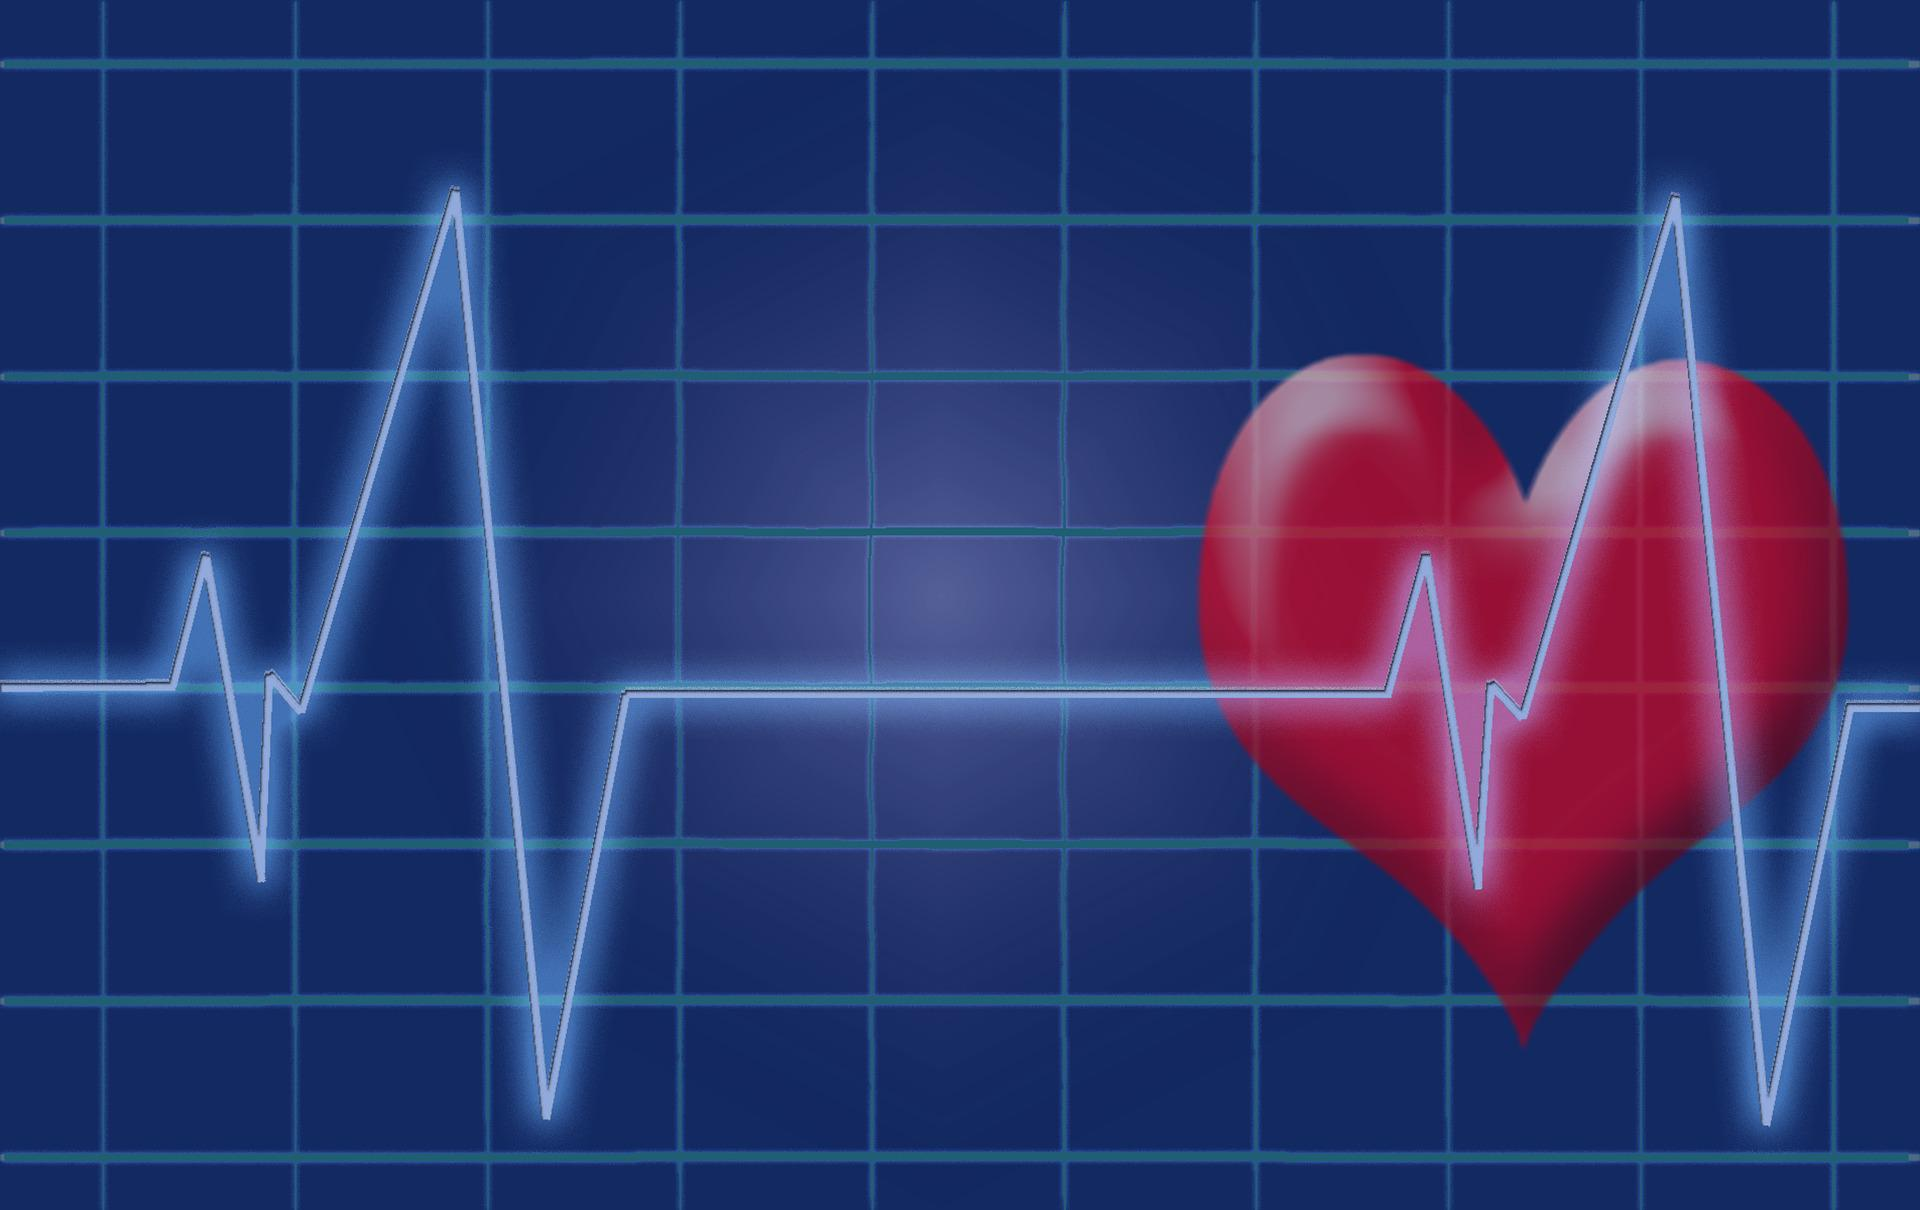 Mesure de tension artérielle